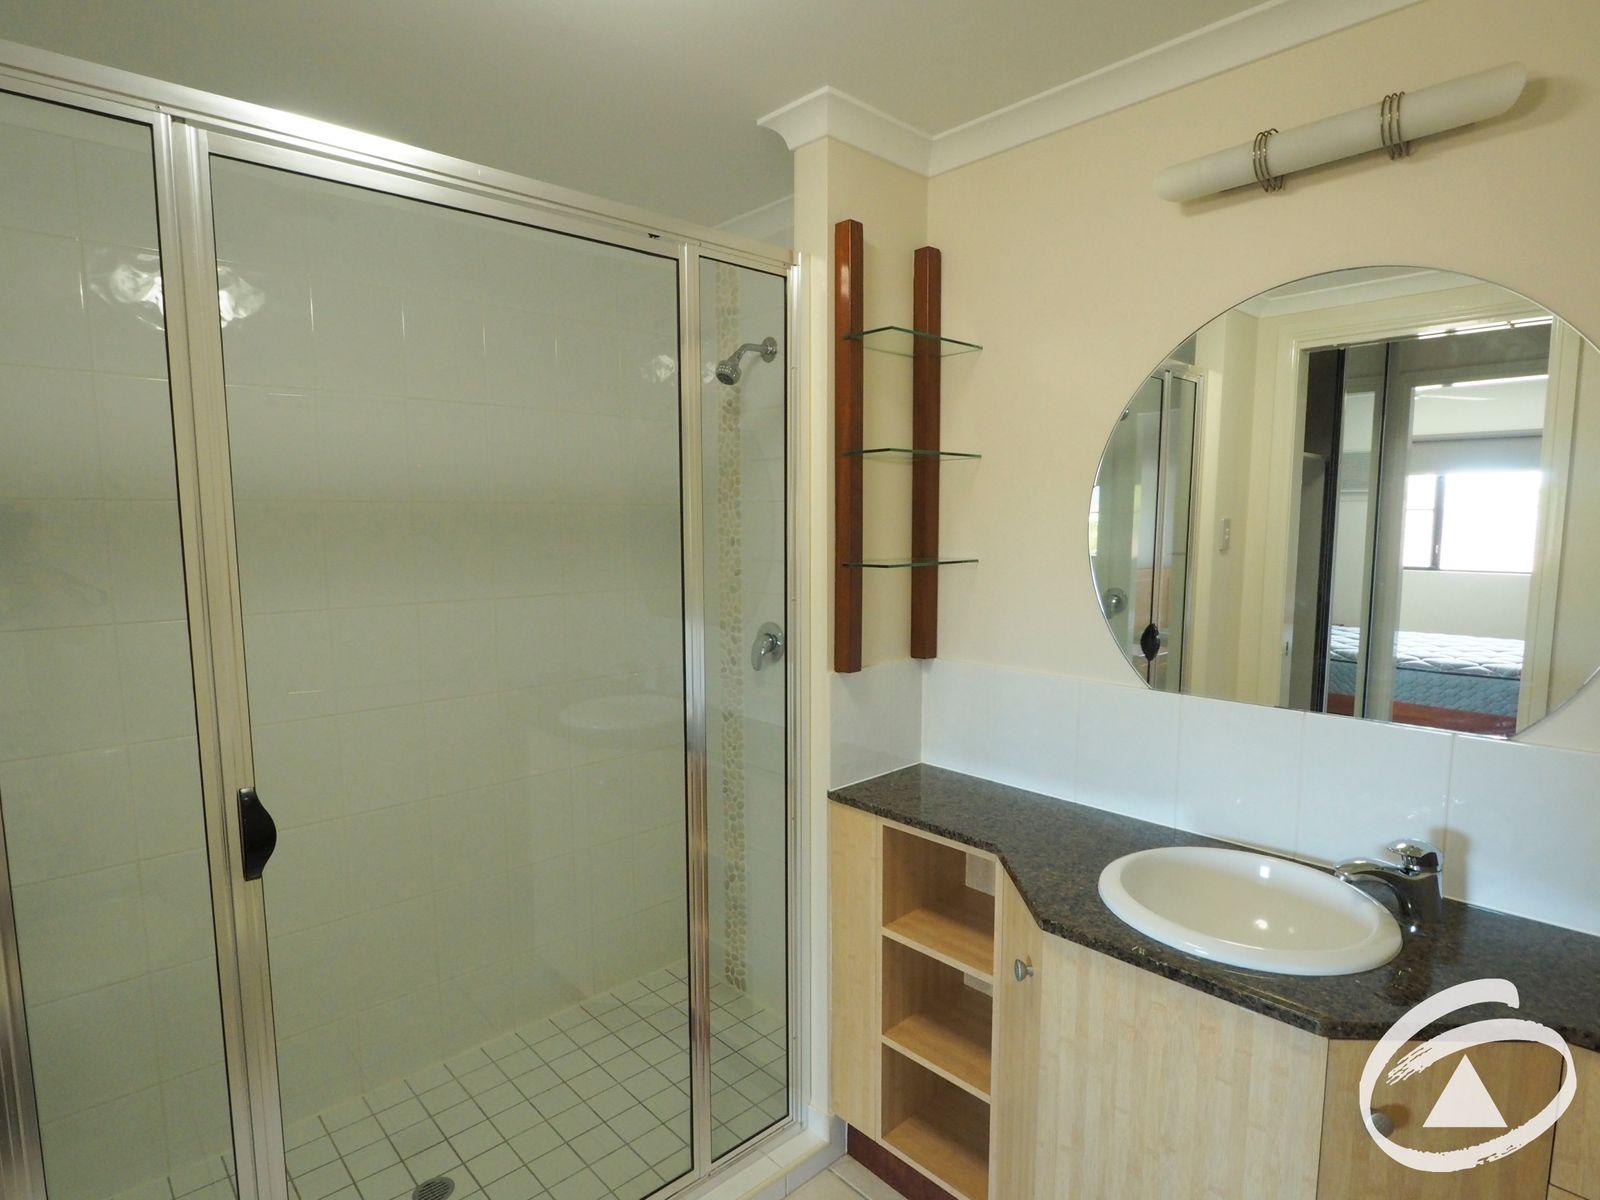 10/38-40 Digger Street, Cairns North, QLD 4870